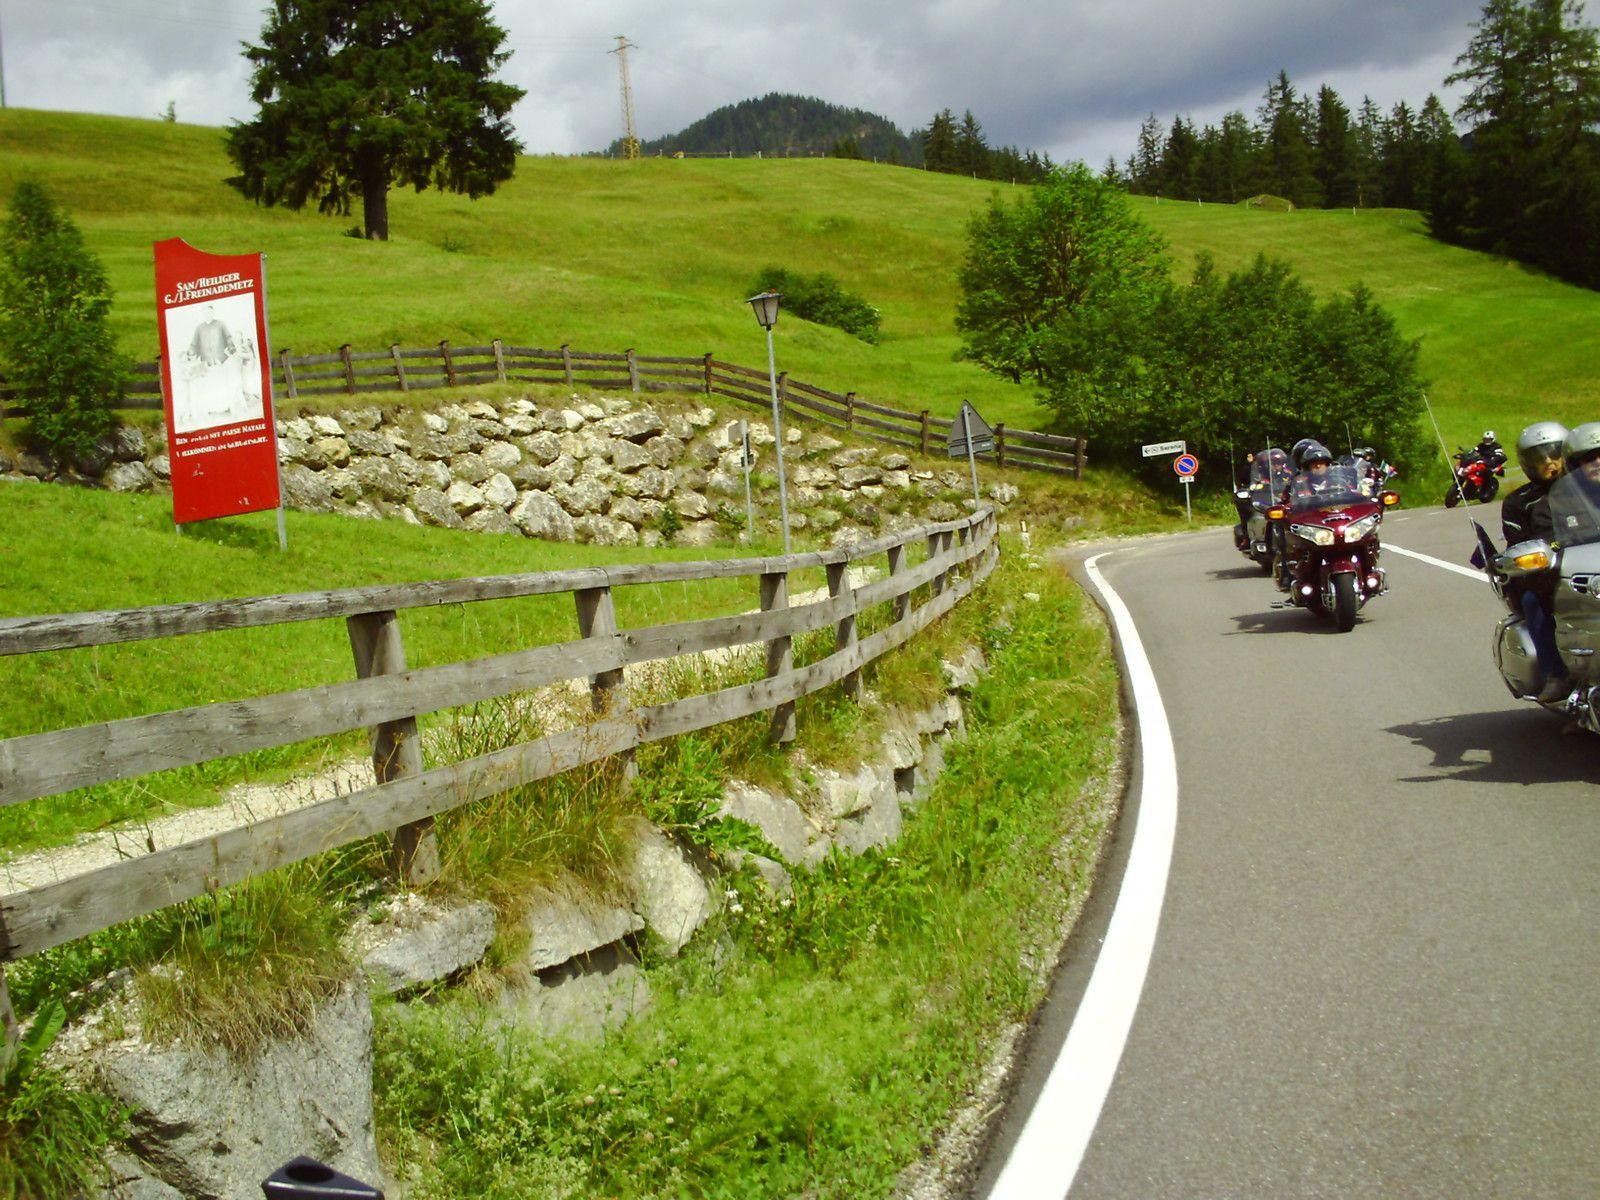 Goldwing Unsersbande - Périple Dolomites et Cinque terre  4th day Passo del Gardena et Bolzano